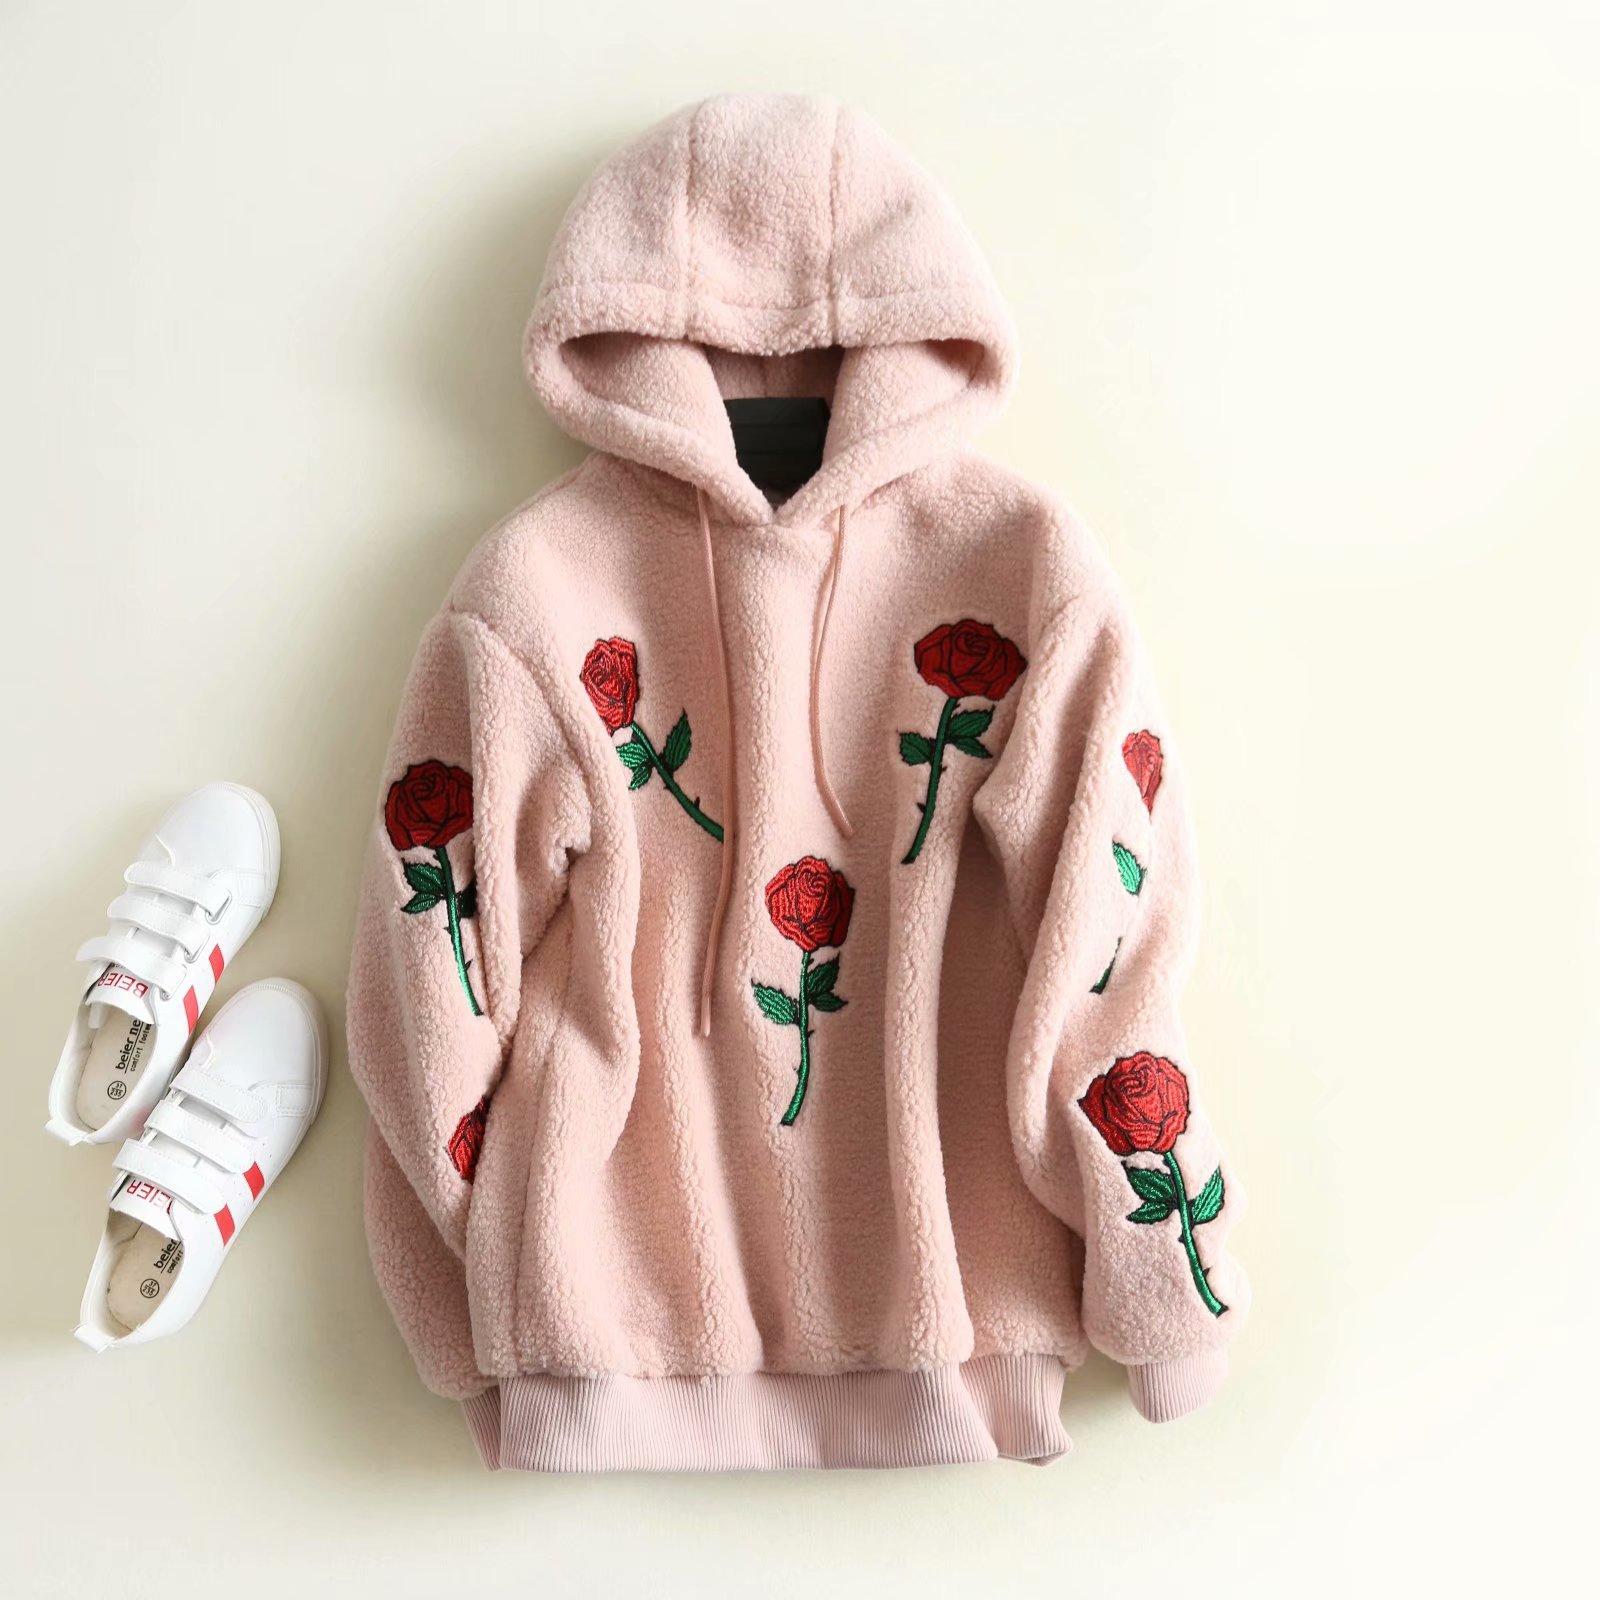 New Valentine Women Sweatshirt Embroidery Roses Hoodies Pink Sweatshirts Clothing Plus Size